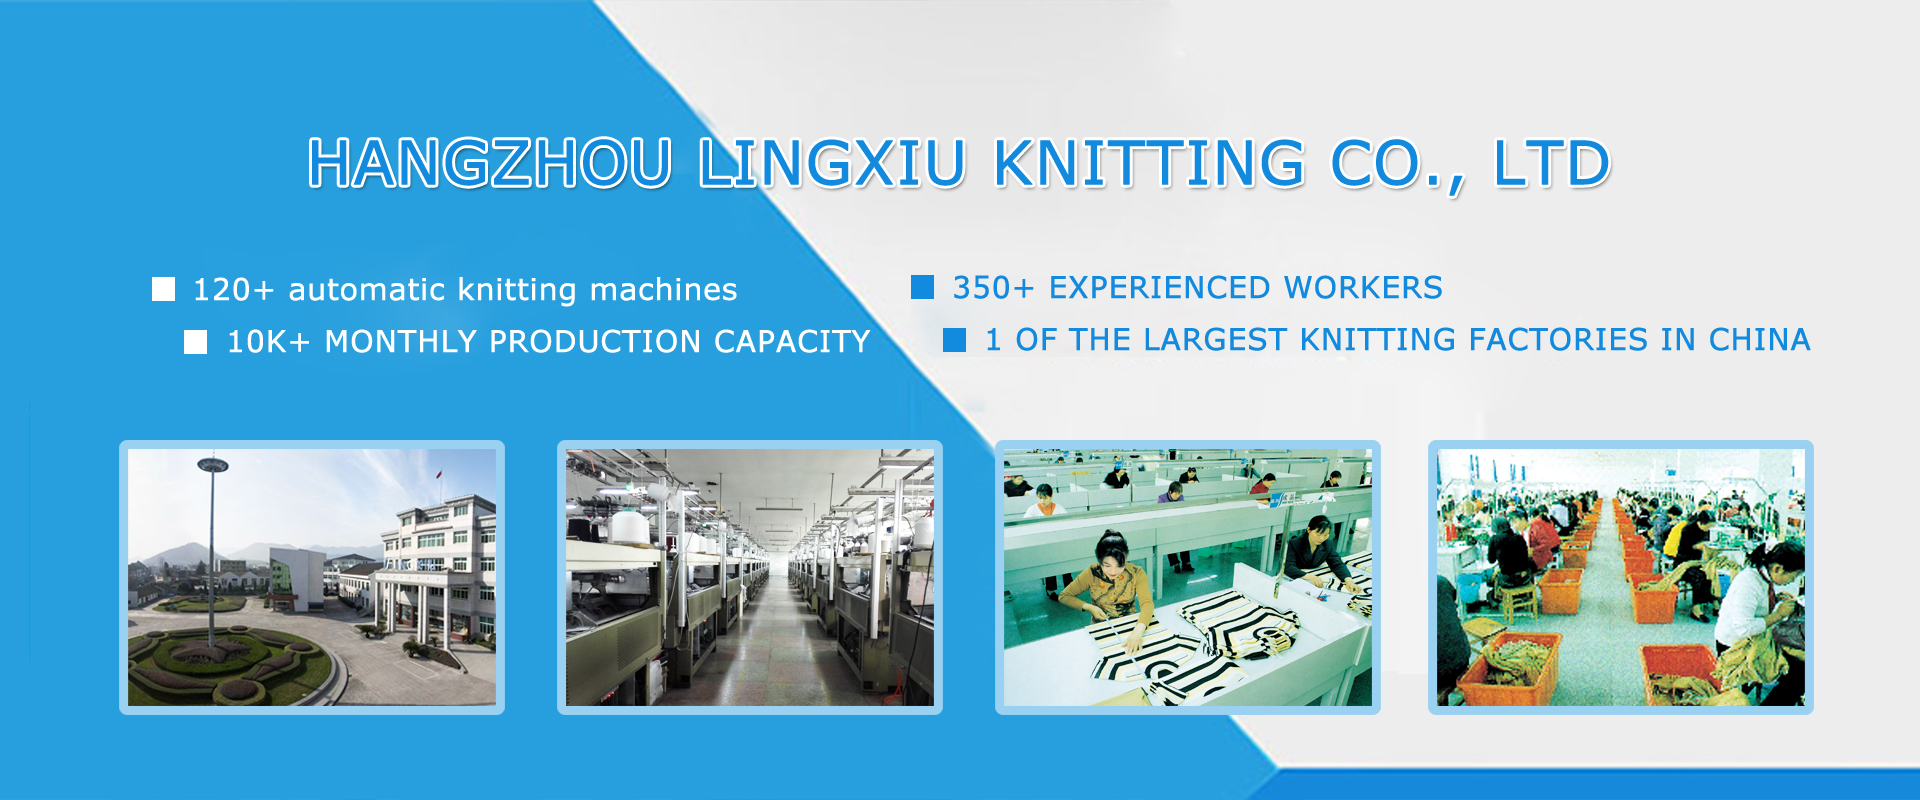 Kittenish Knitting Co Ltd : Hangzhou lingxiu knitting co ltd